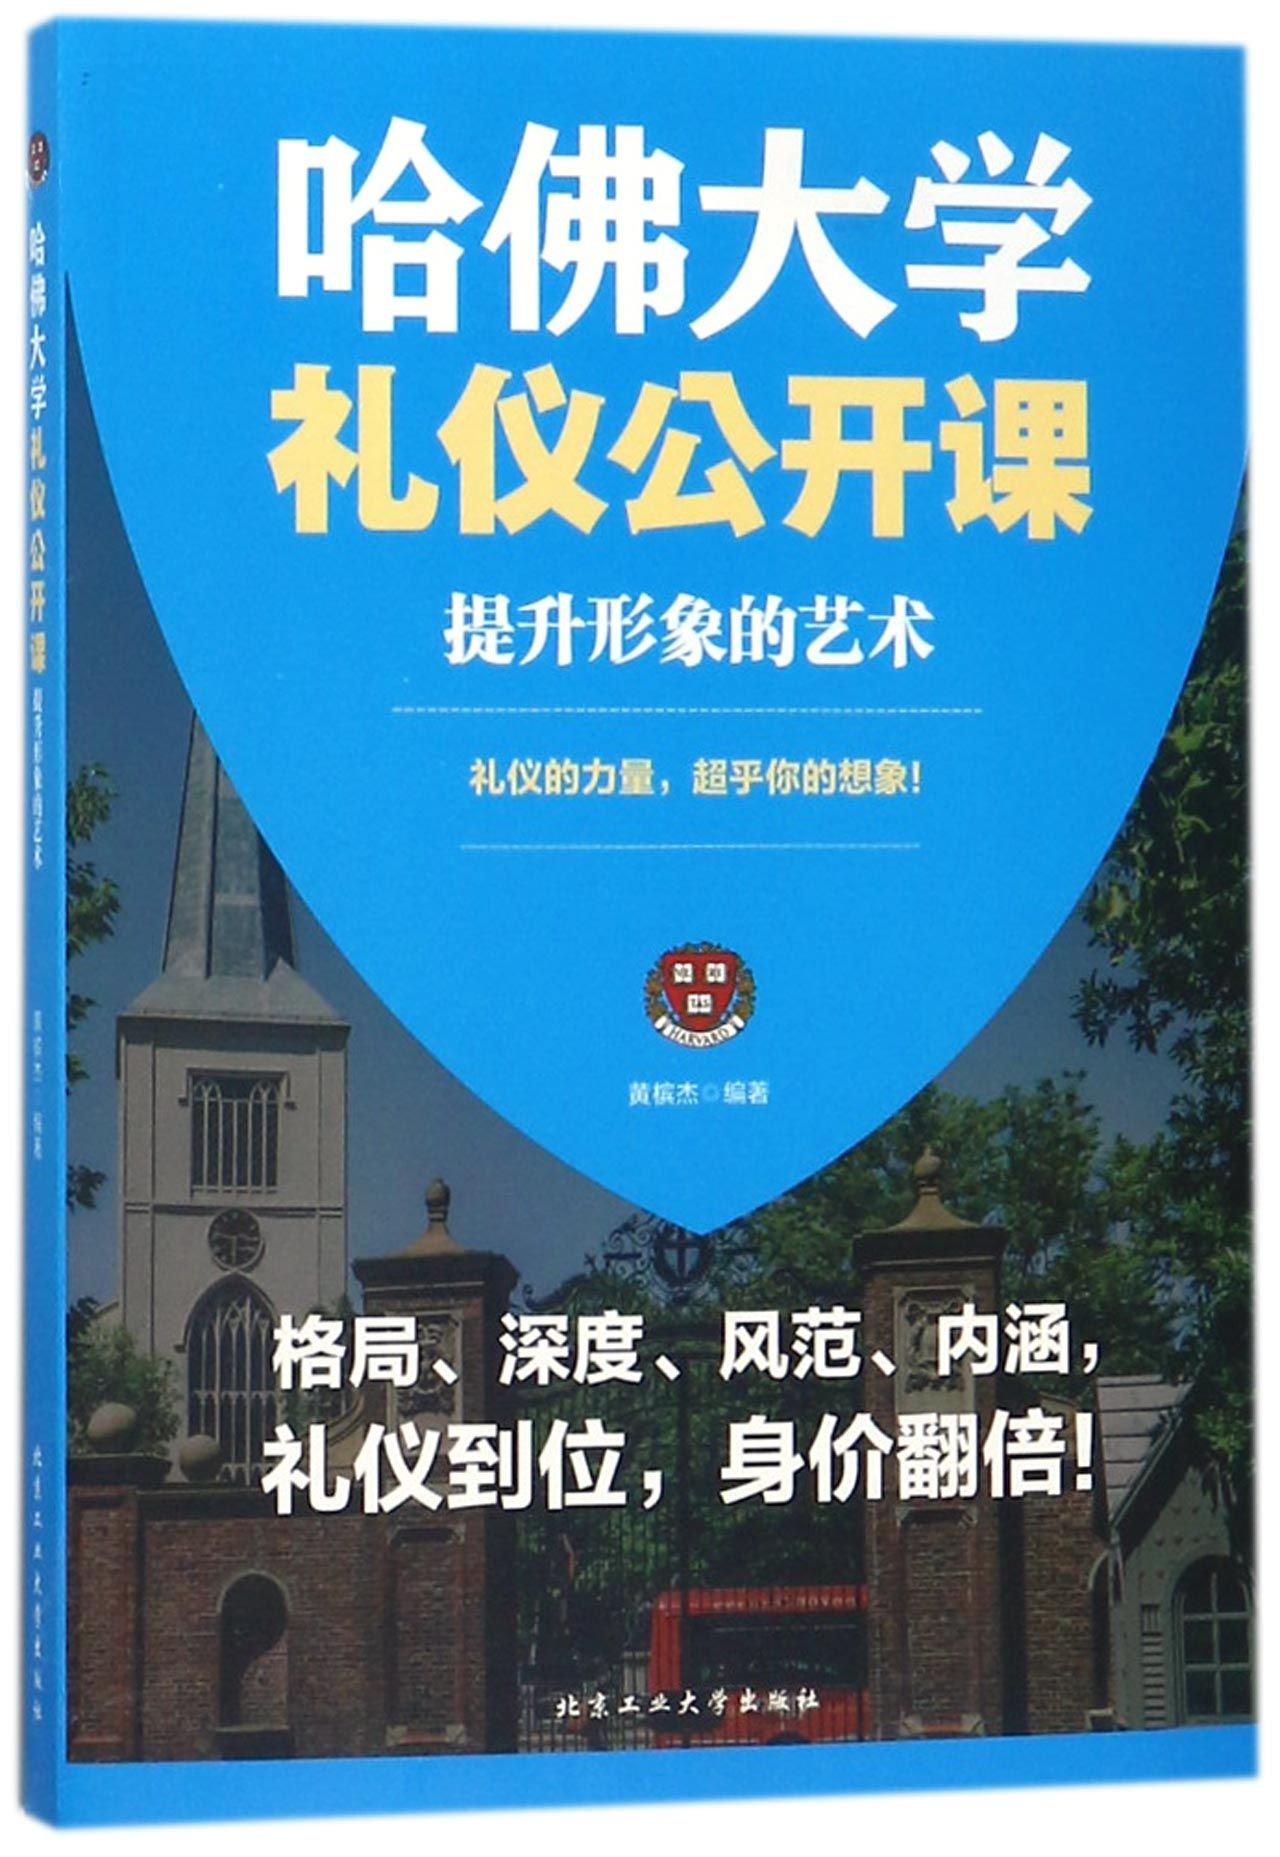 Etiquette Courses of Harvard University (Art of Raising the Profile) (Chinese Edition) pdf